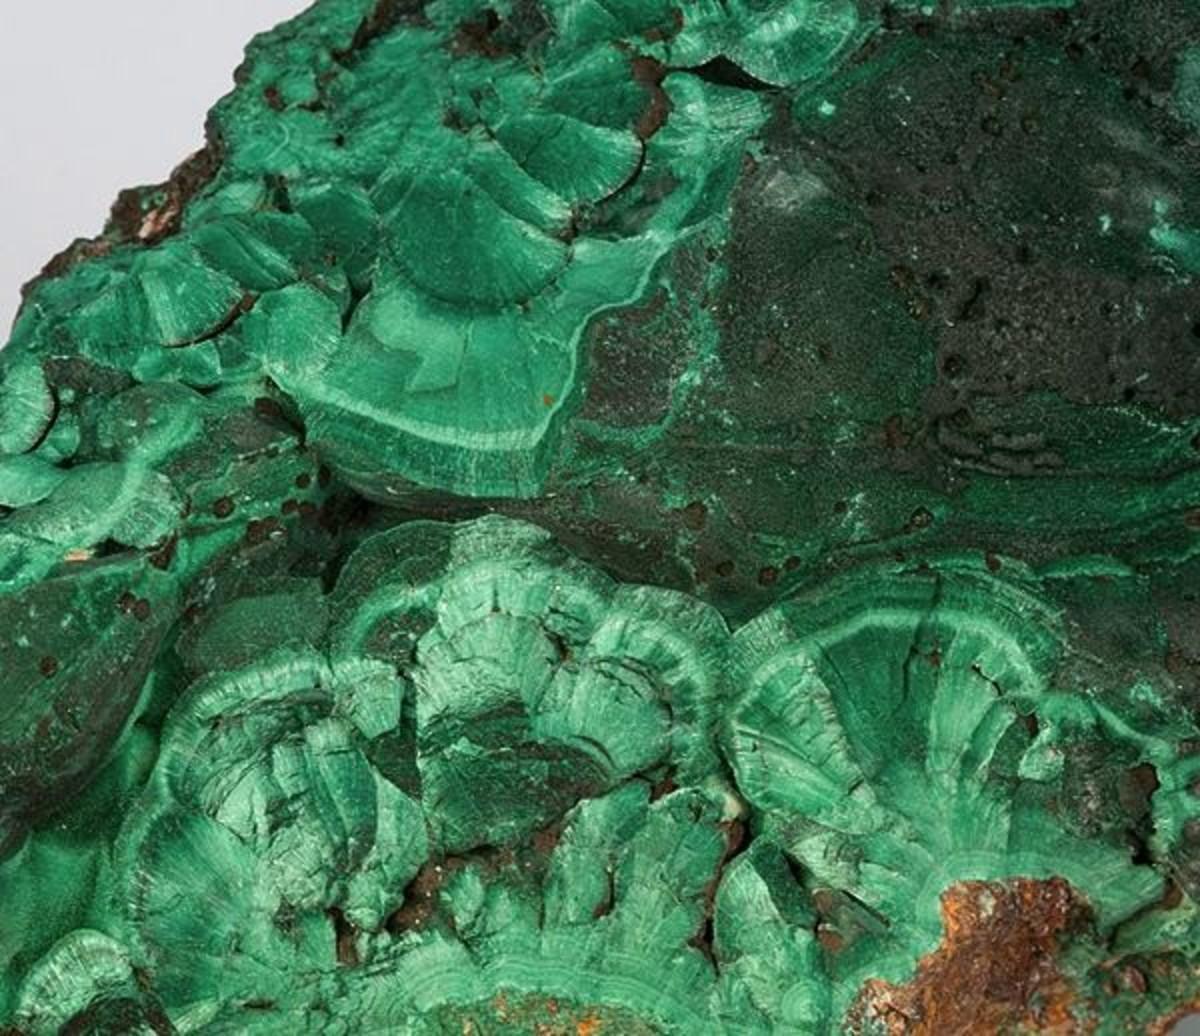 Chatoyant Malachite from Bisbee, Arizona